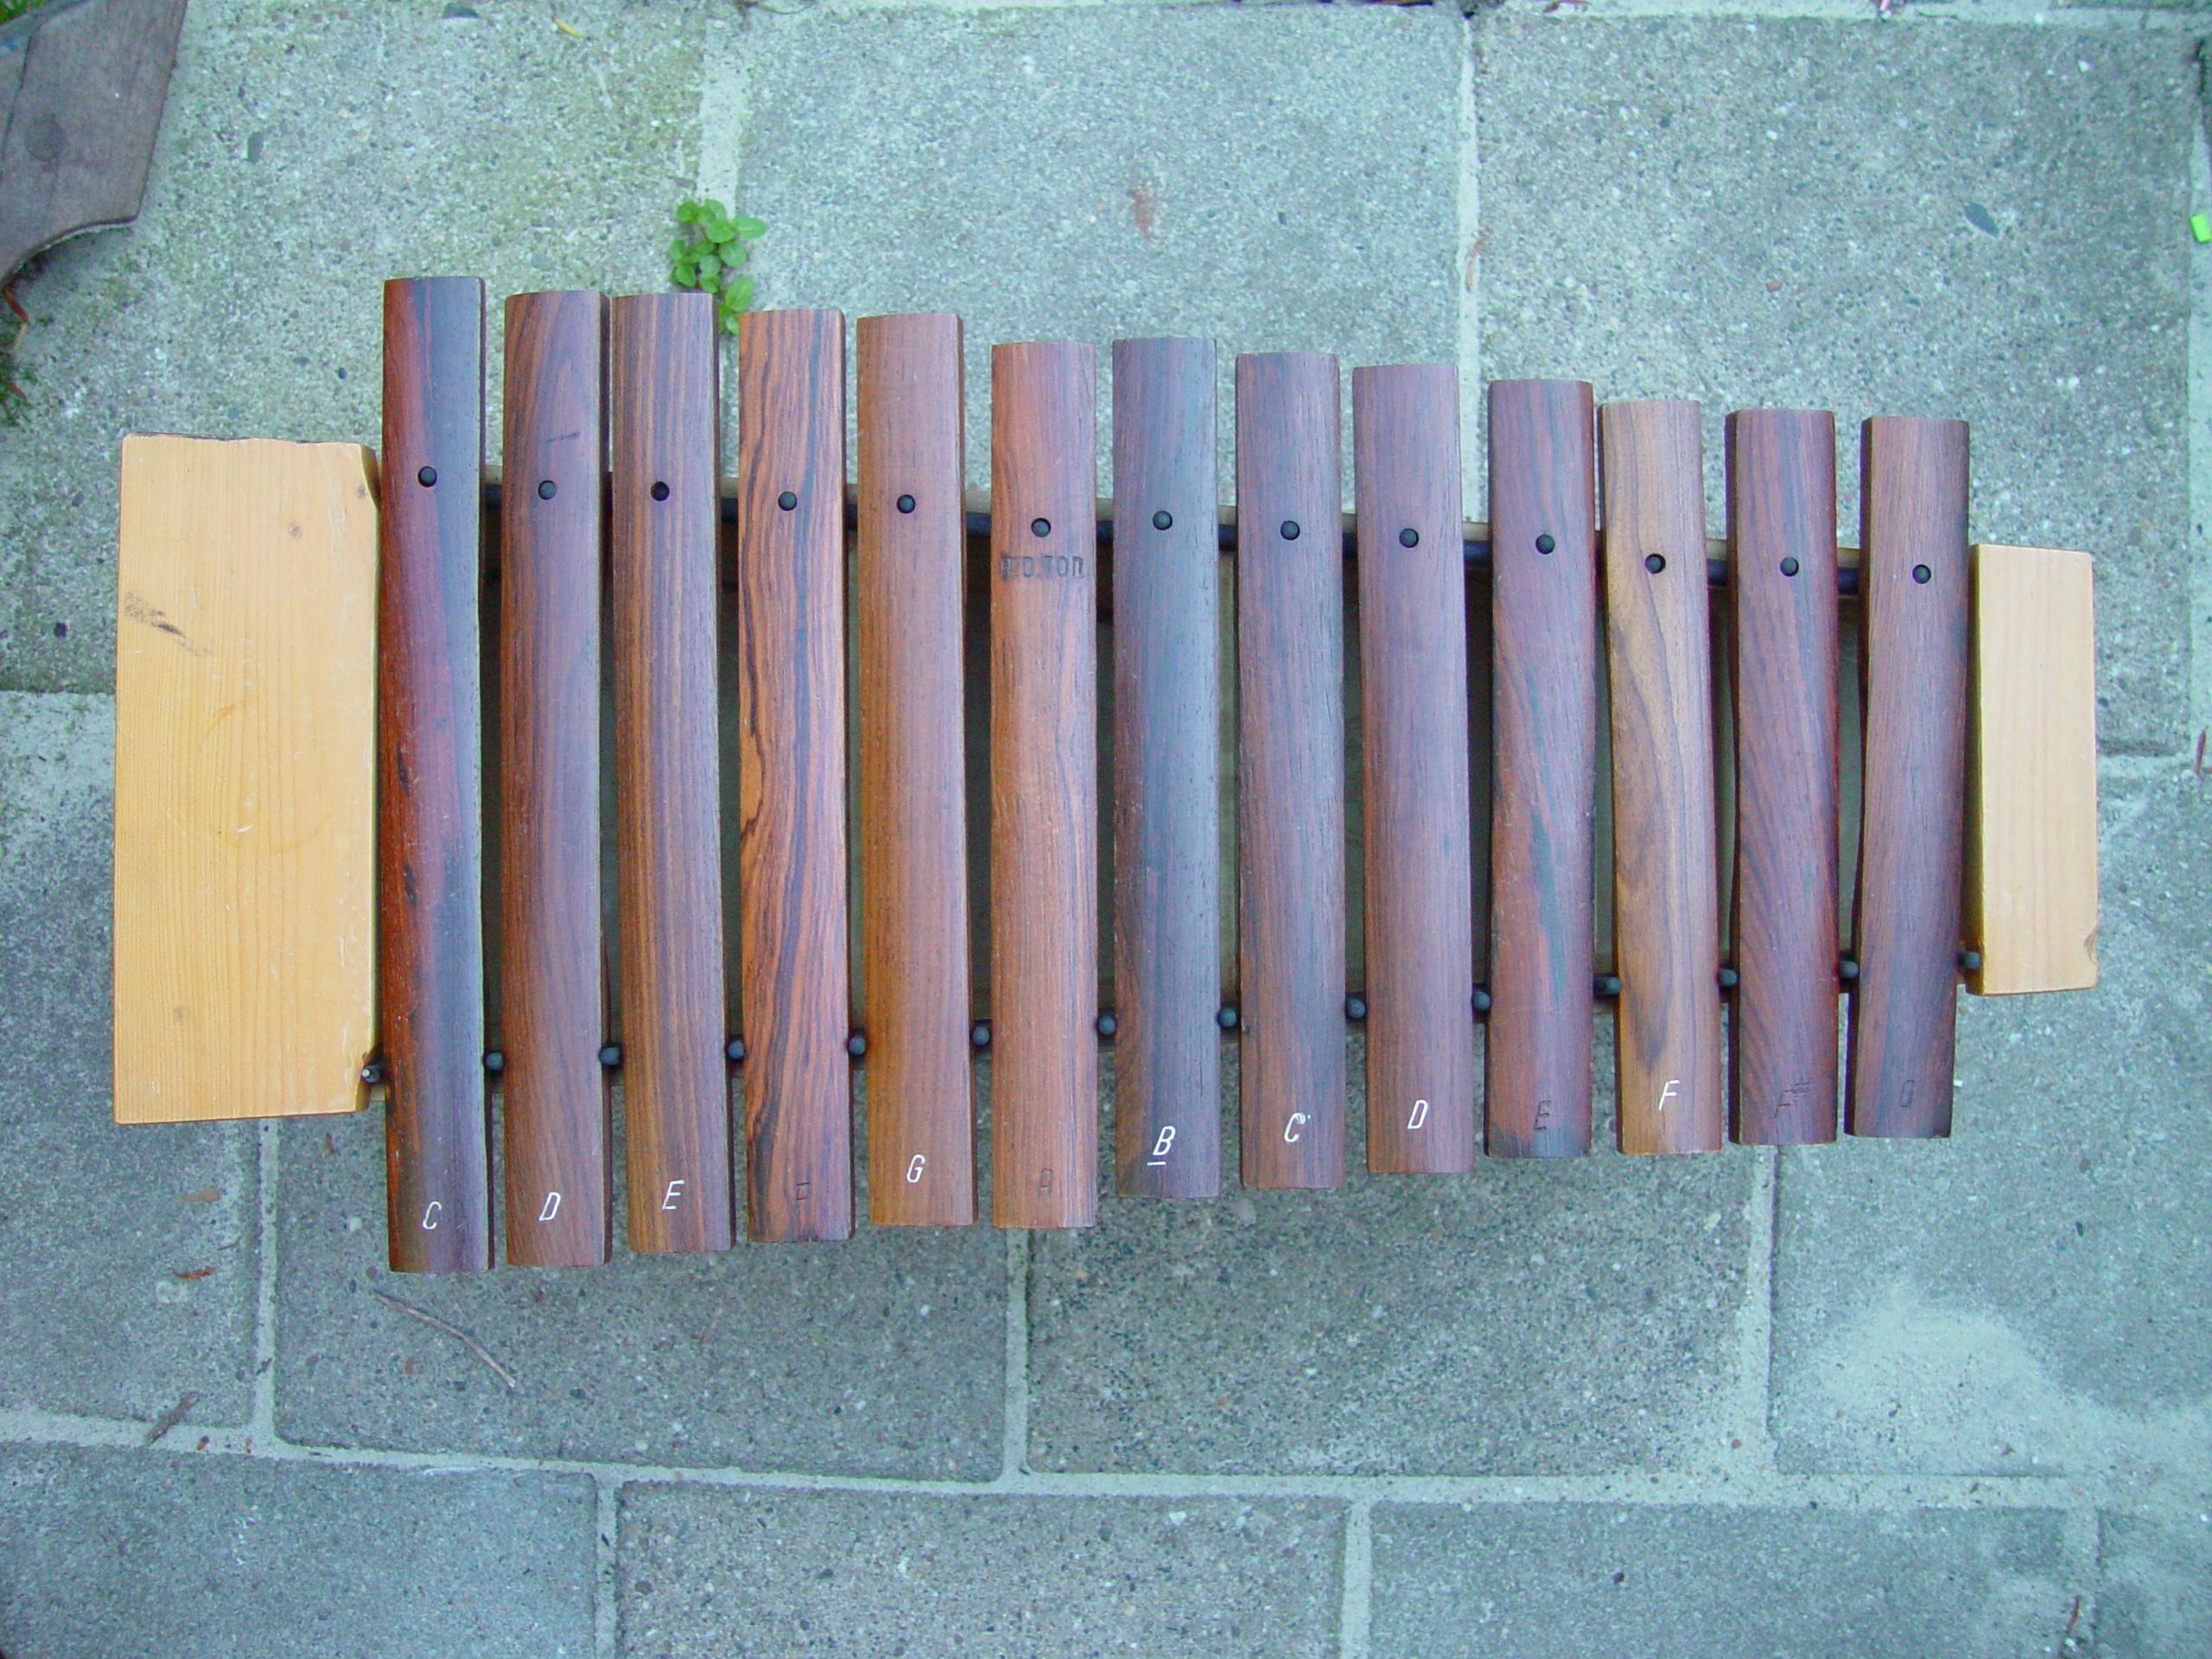 objects xylofoon musical instrument wood texture top bertoltzalm